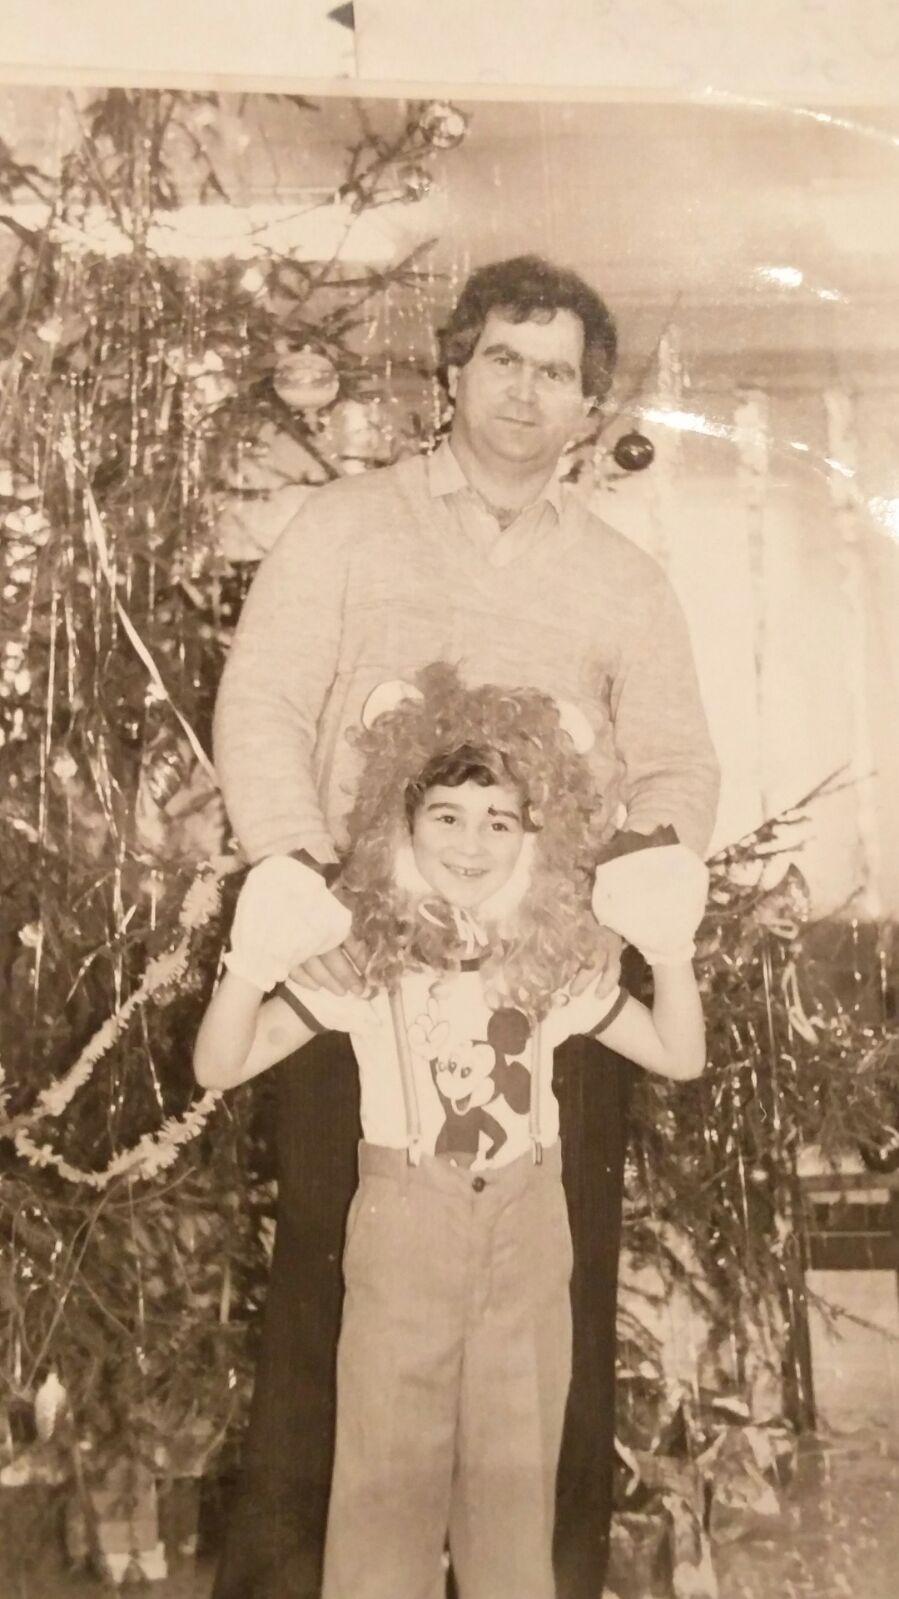 Beri Rozenberg, 1986-1988, לטביה, בריה_מ. אני עם אבא שלי. את החולצה שאני לובש הכין אבא שלי עם הדפס ש